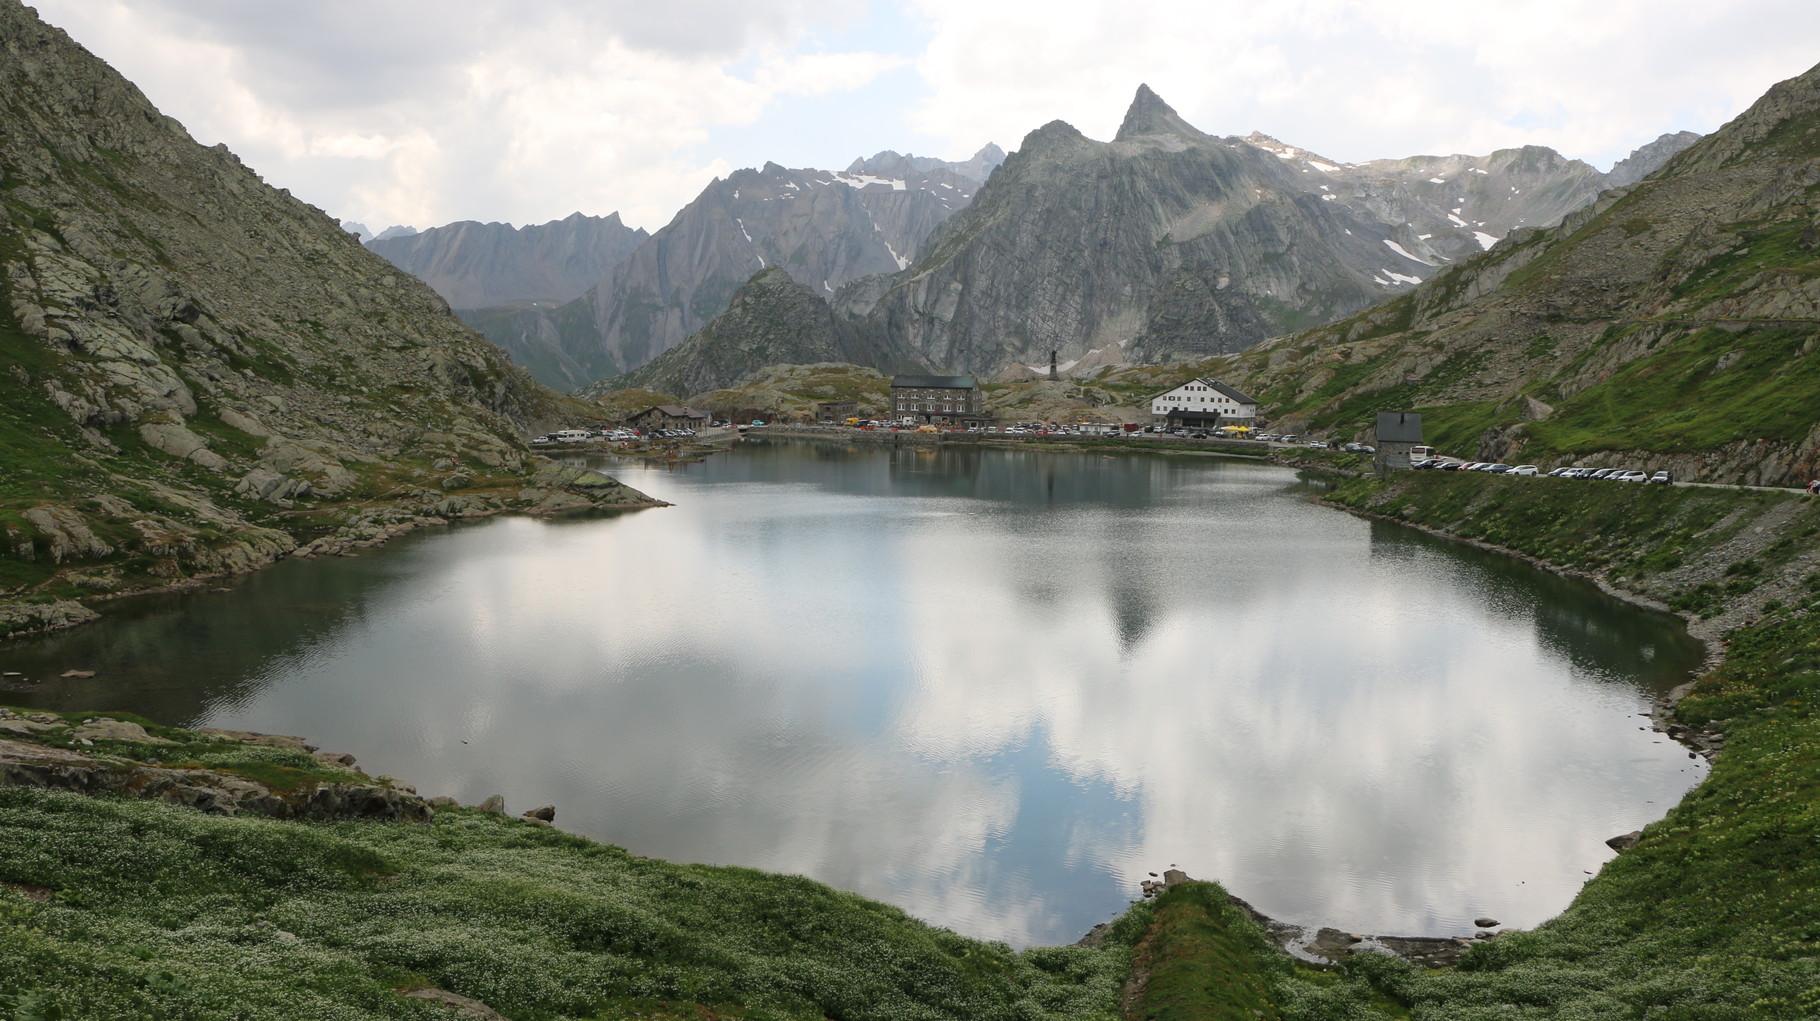 Tappa 1: Colle del Gran San Bernardo - Echevennoz | 14,9 km